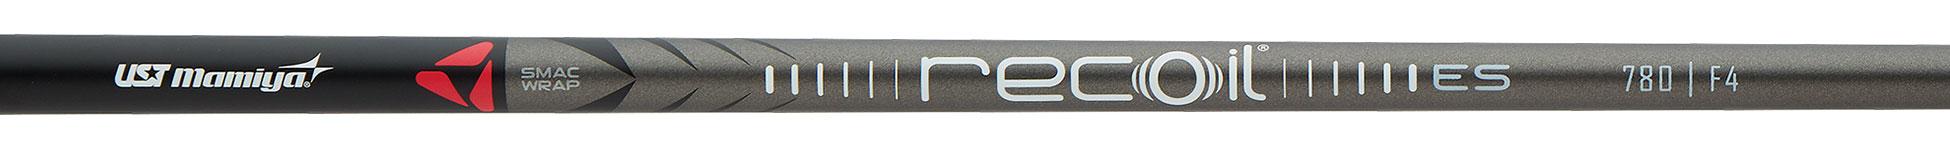 UST Recoil 780 w/ SMACWRAP